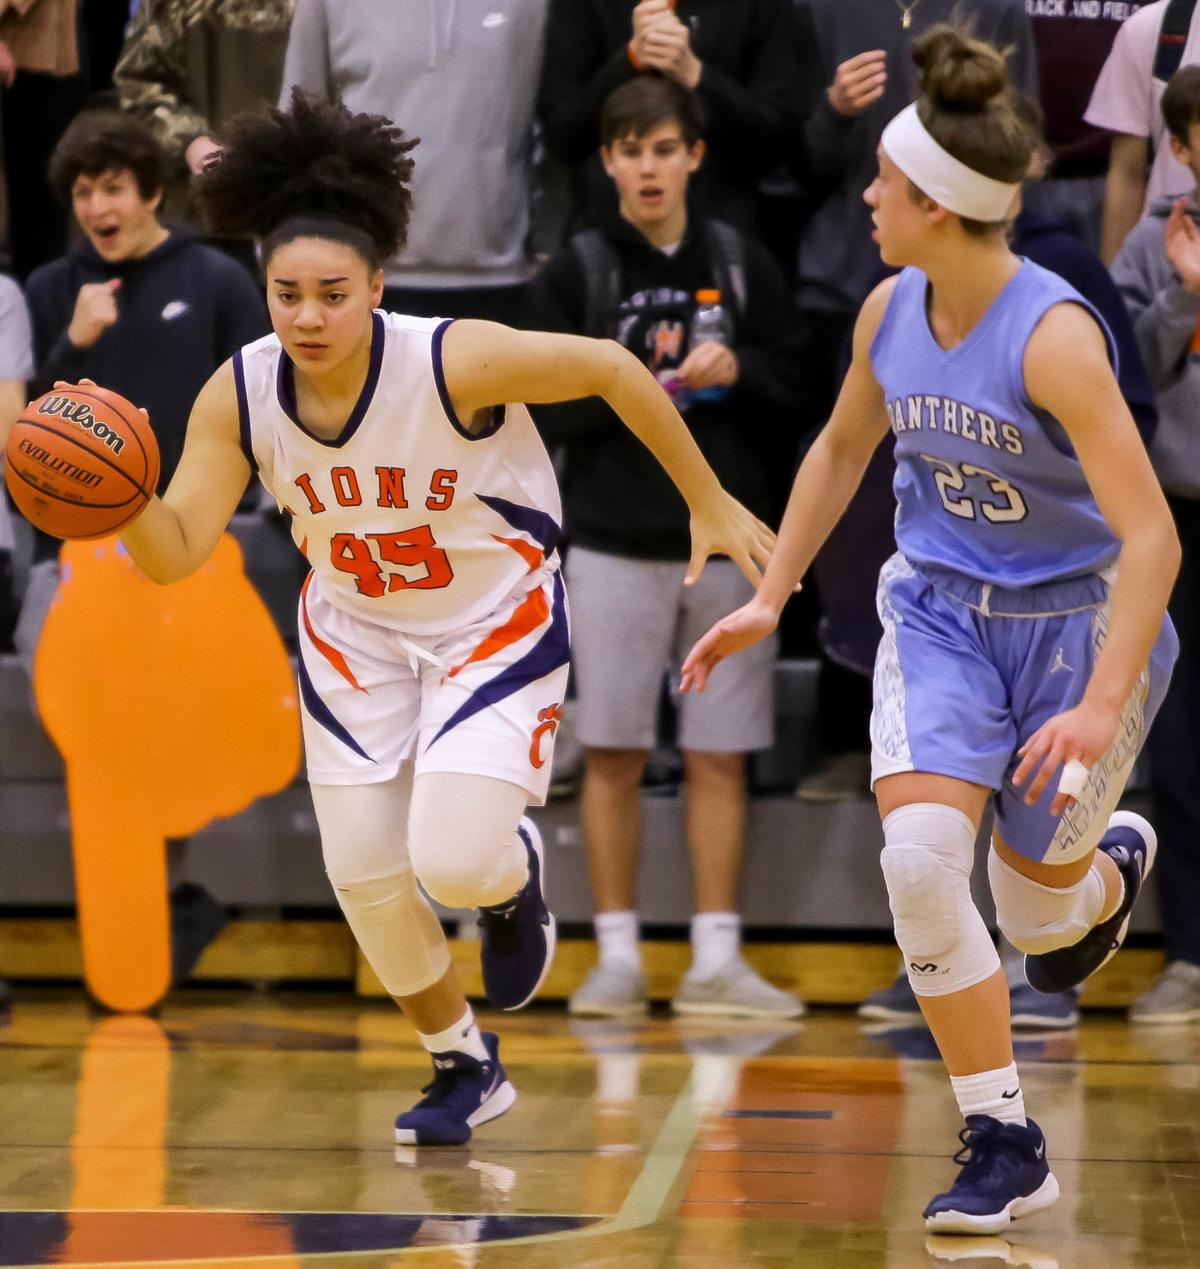 PHOTOS: Pinckneyville at Carterville Girl's Basketball